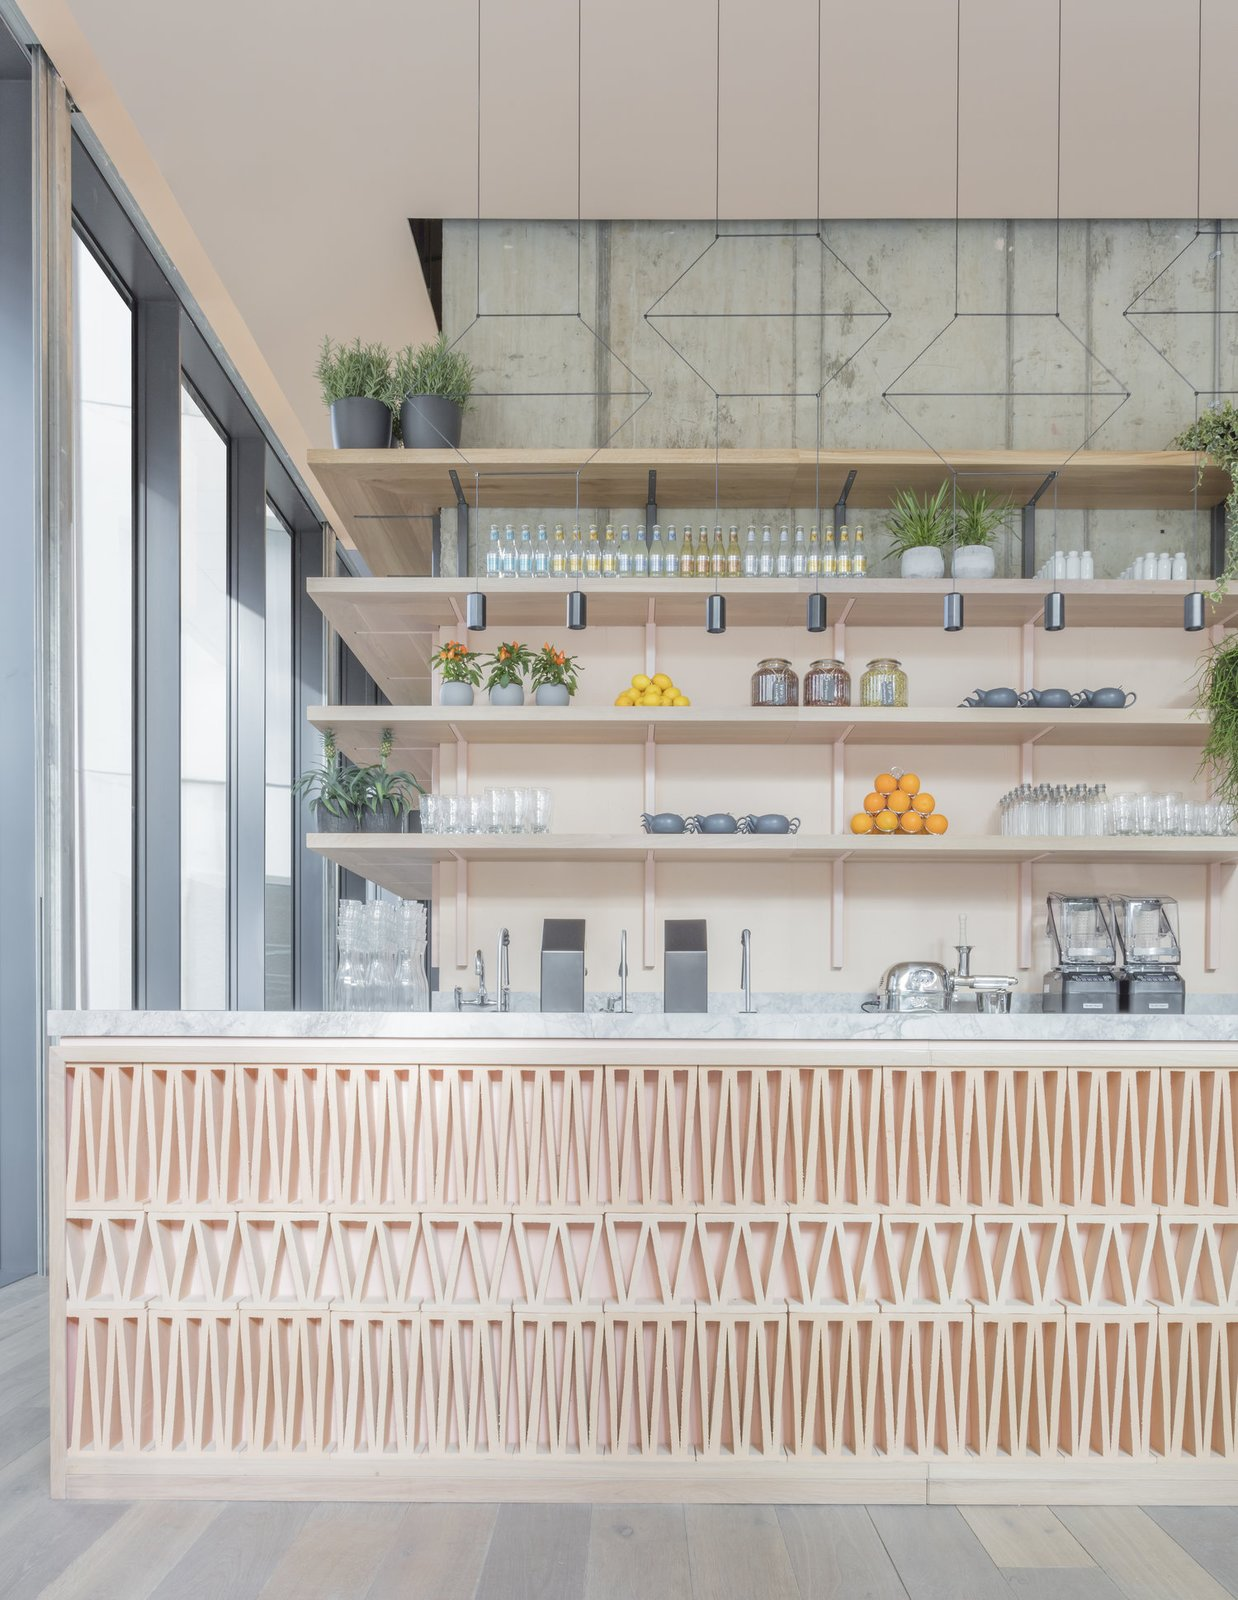 Kitchen, Pendant Lighting, Open Cabinet, Medium Hardwood Floor, and Marble Counter  Photo 7 of 7 in Leman Locke London by Grzywinski+Pons